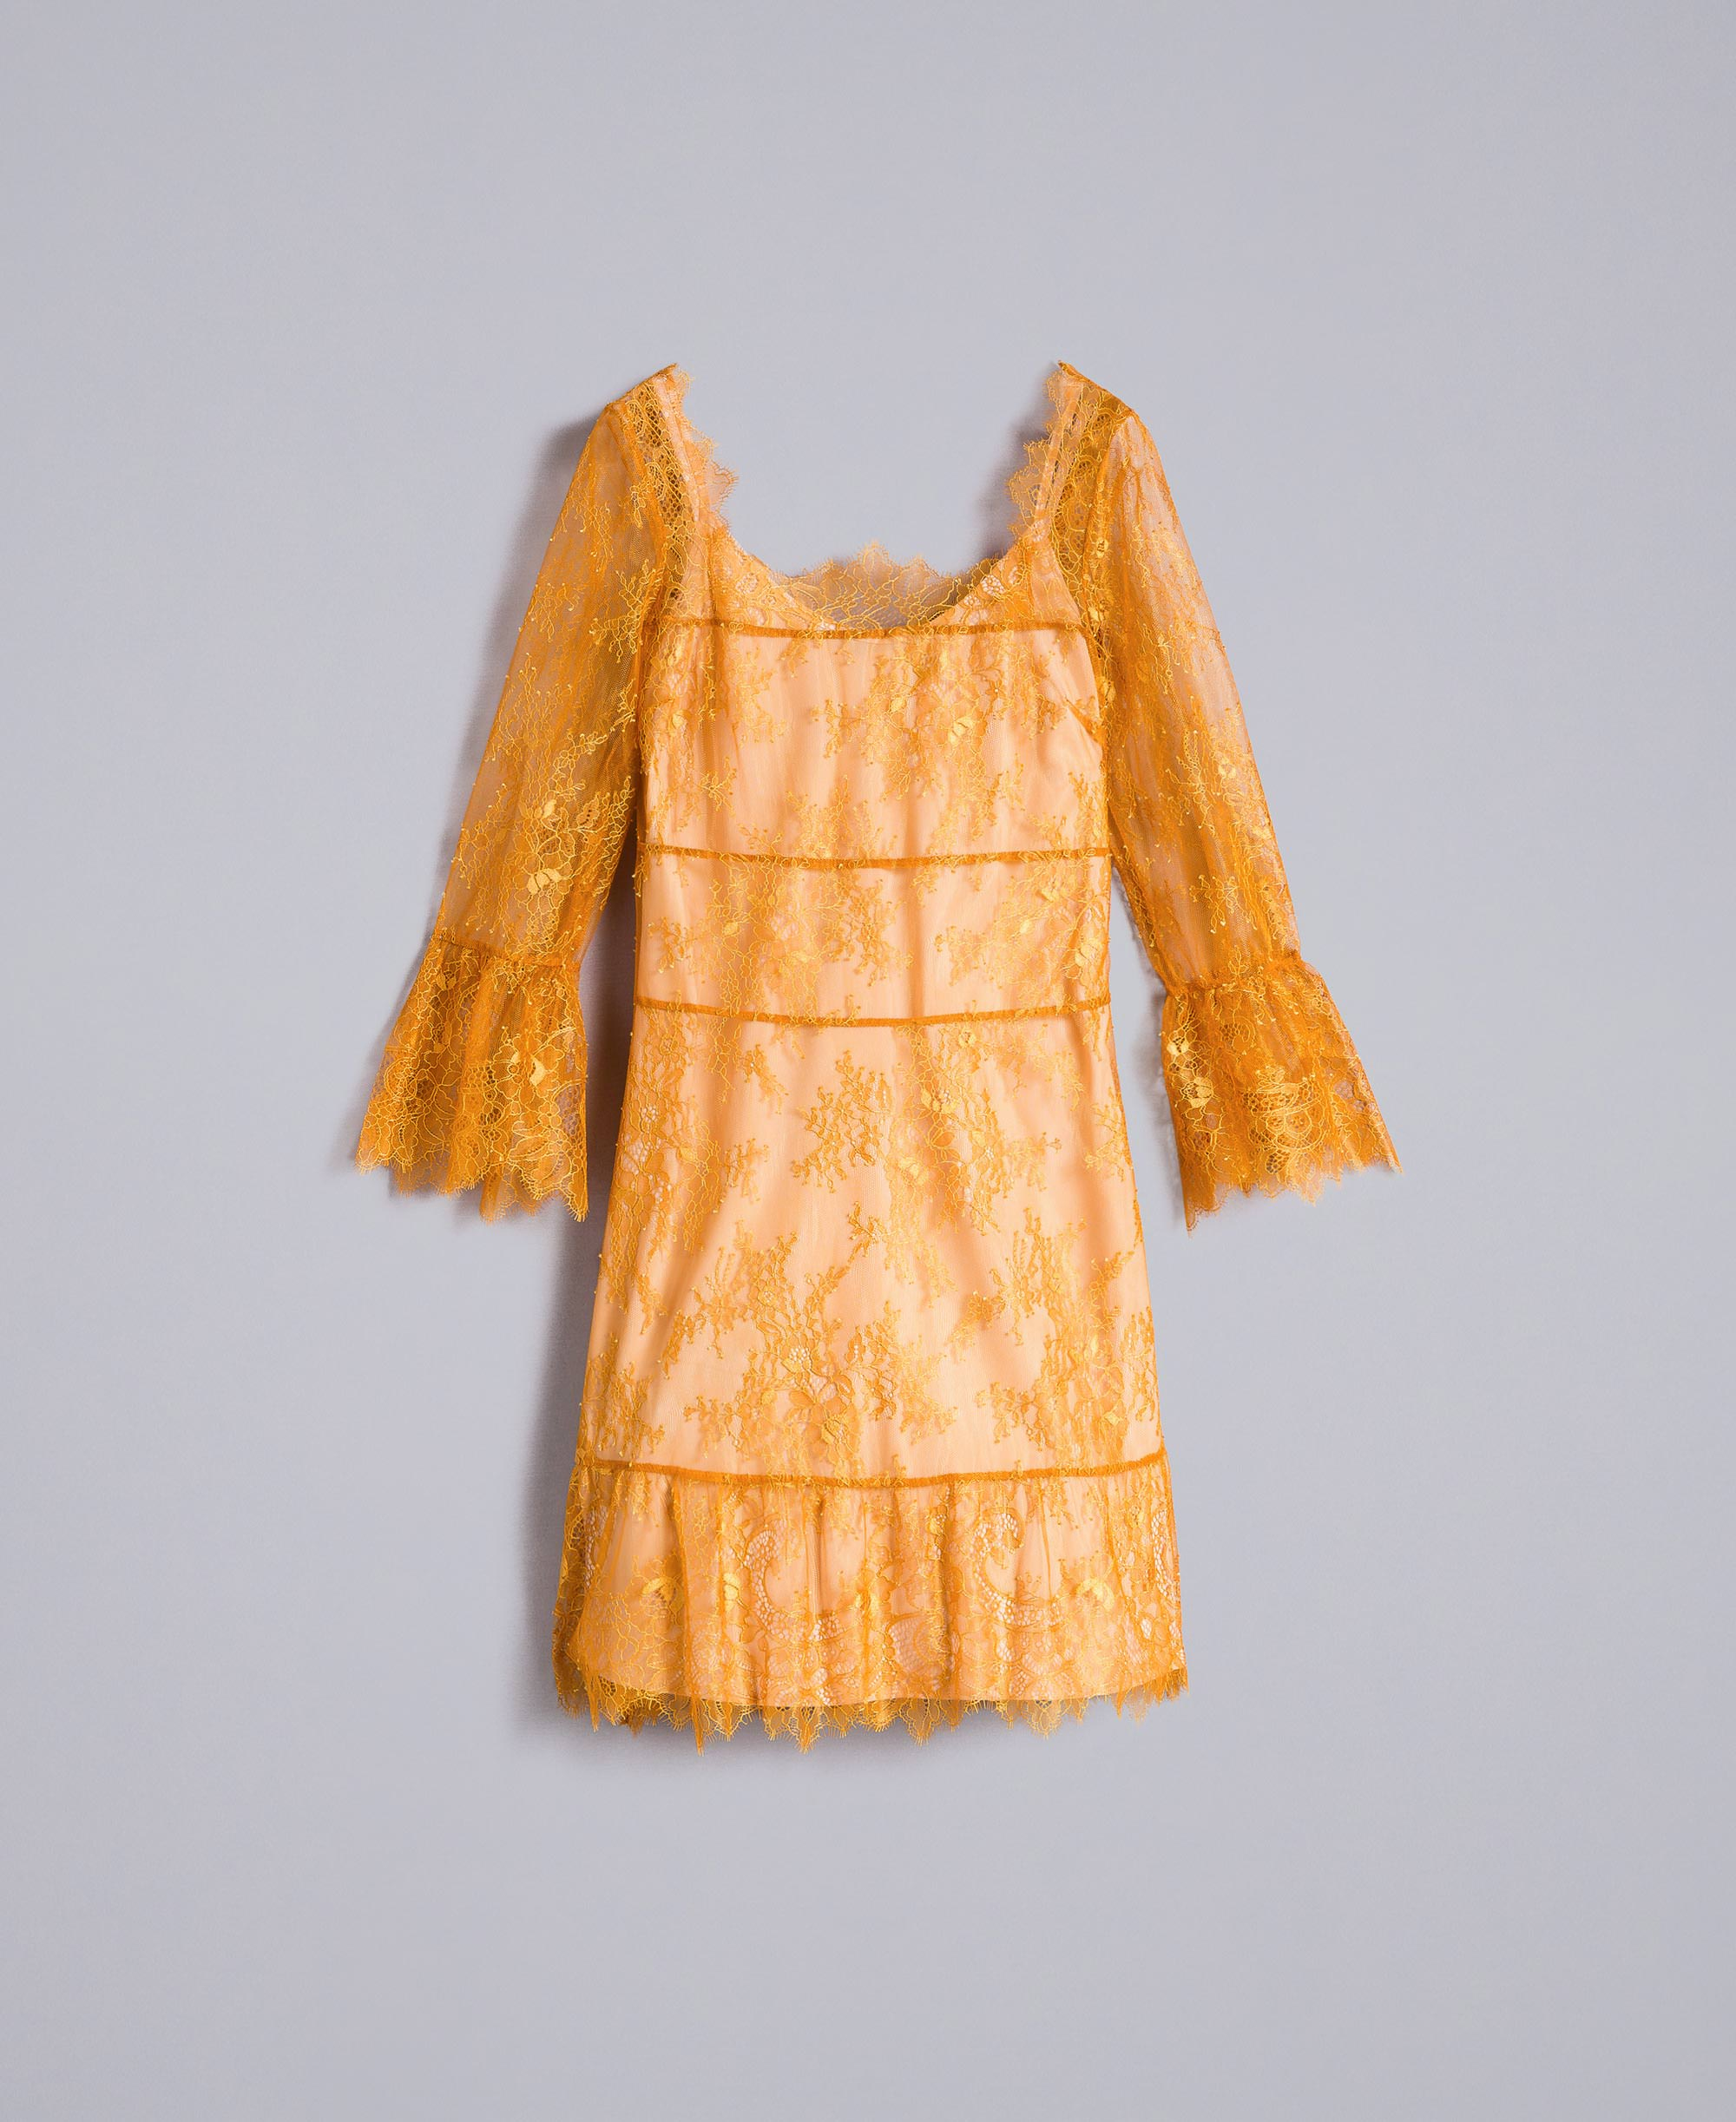 kurzes kleid aus valenciennesspitze